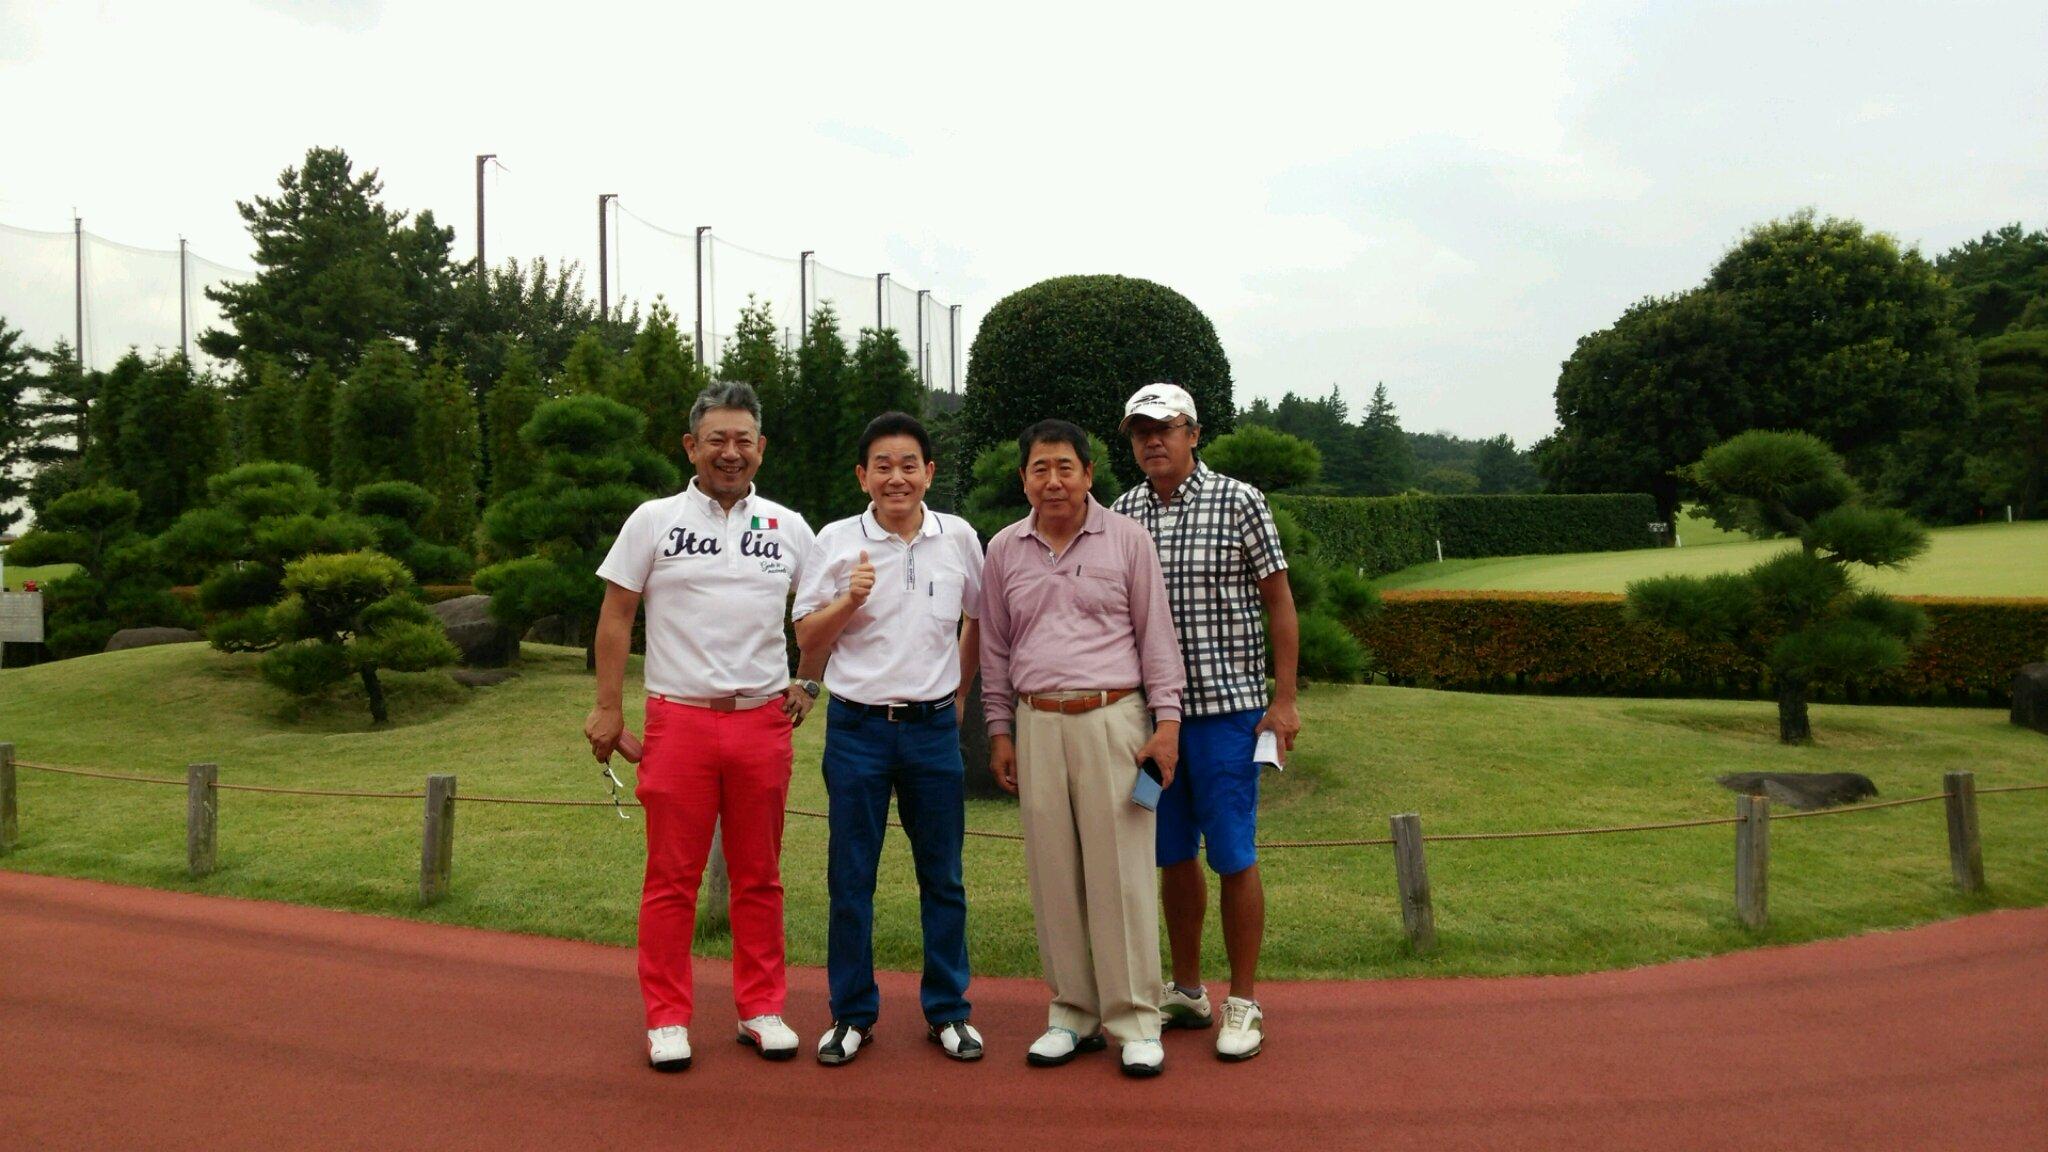 YK会ゴルフコンペで3位入賞!_e0119092_17055790.jpg